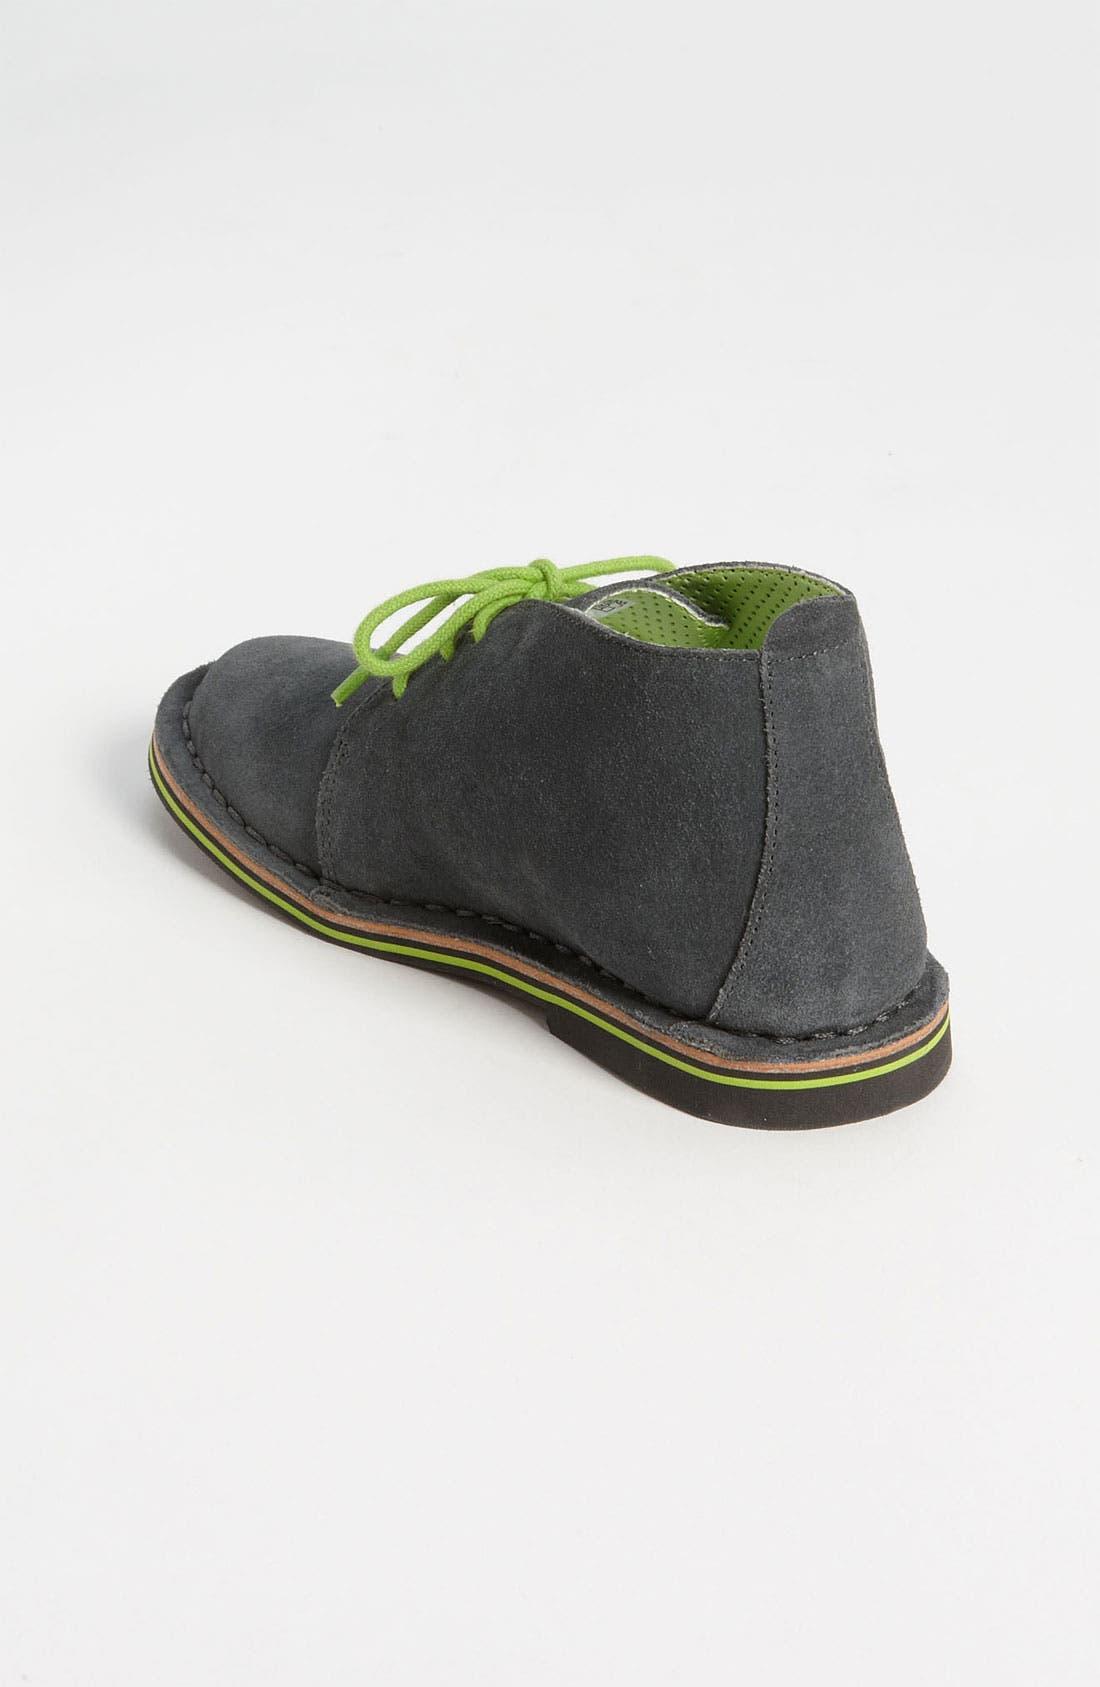 Alternate Image 2  - Cole Haan 'Air Paul - Stripe' Chukka Boot (Toddler, Little Kid & Big Kid)